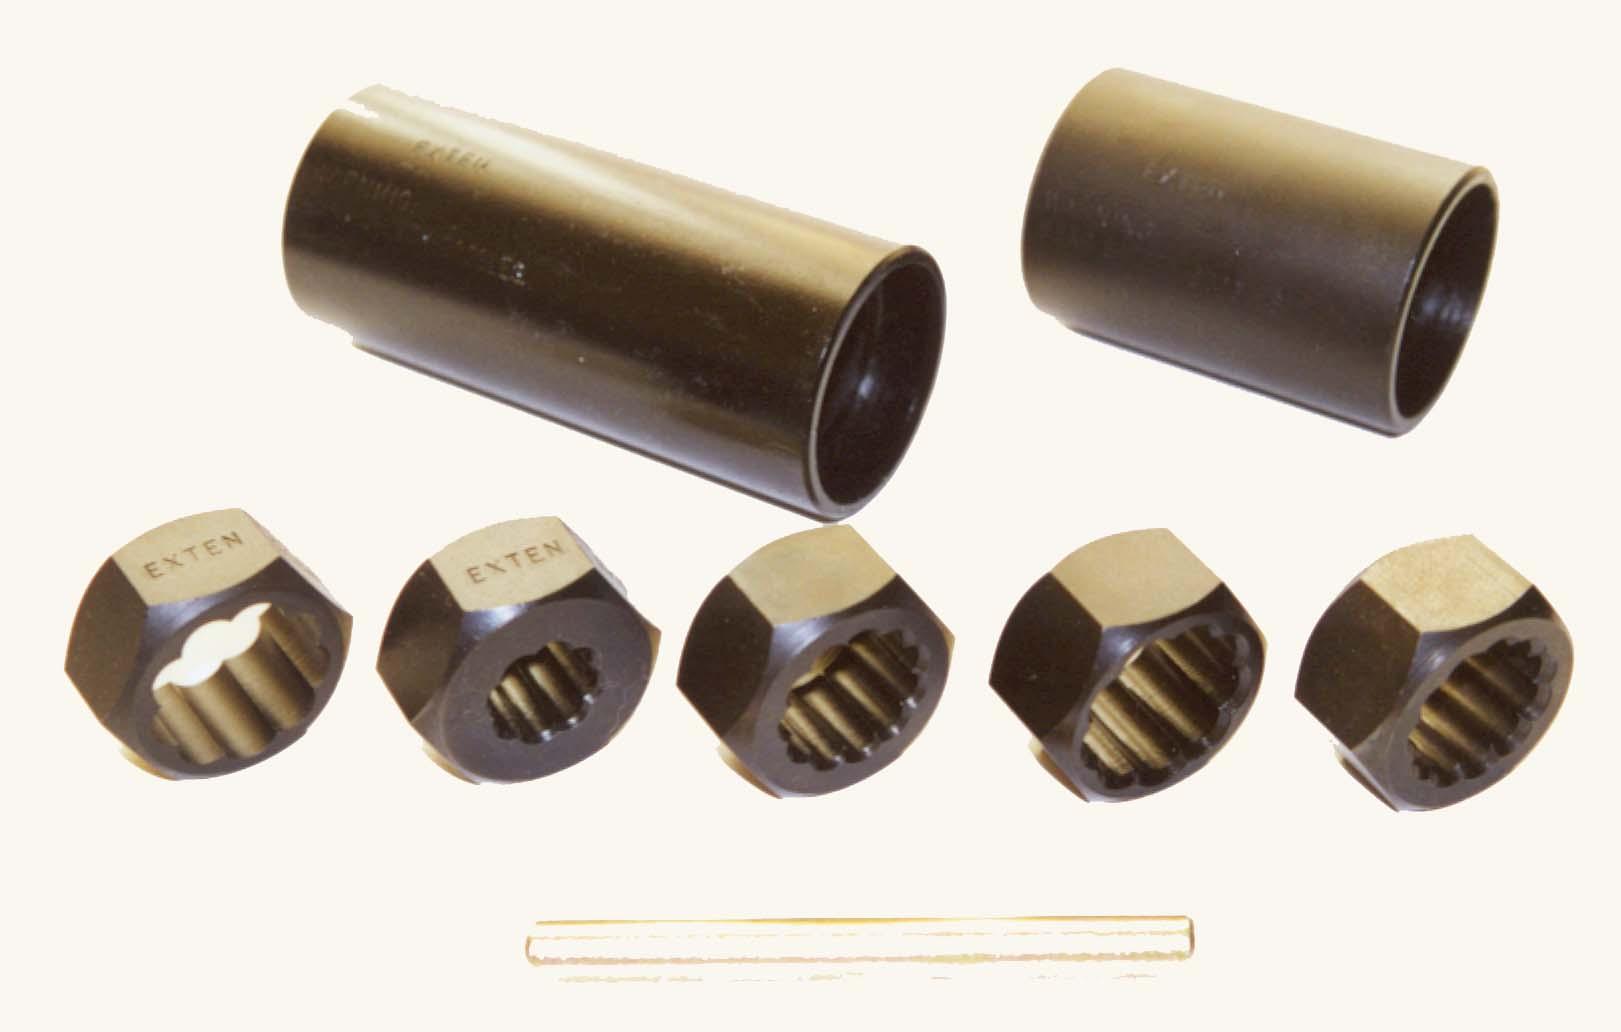 Exten, INC  - Exten's Lug-Off Tools